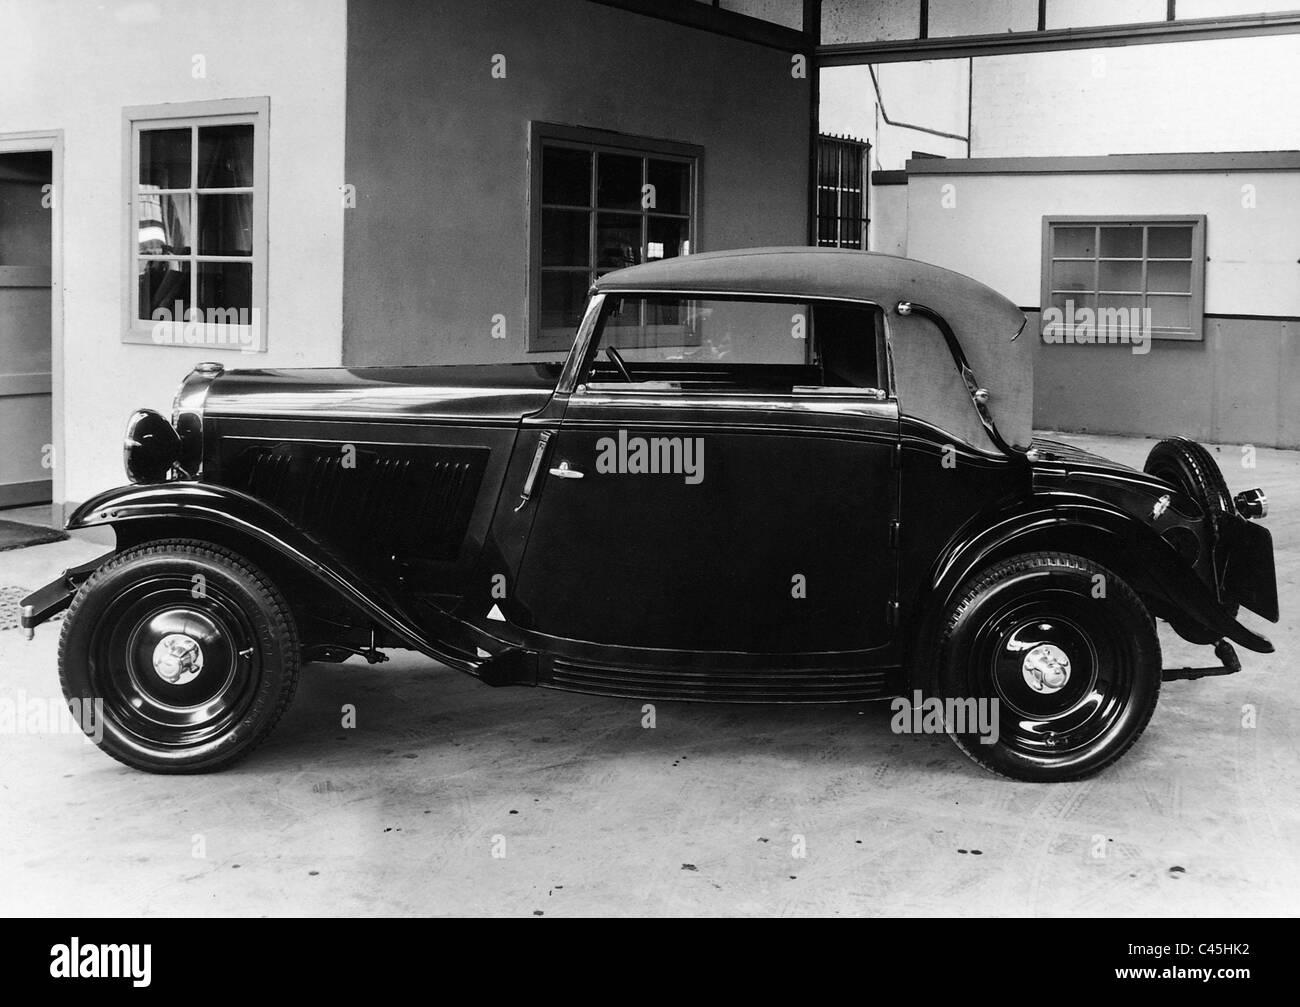 Opel model, 1.8 liter version, 1932 - Stock Image